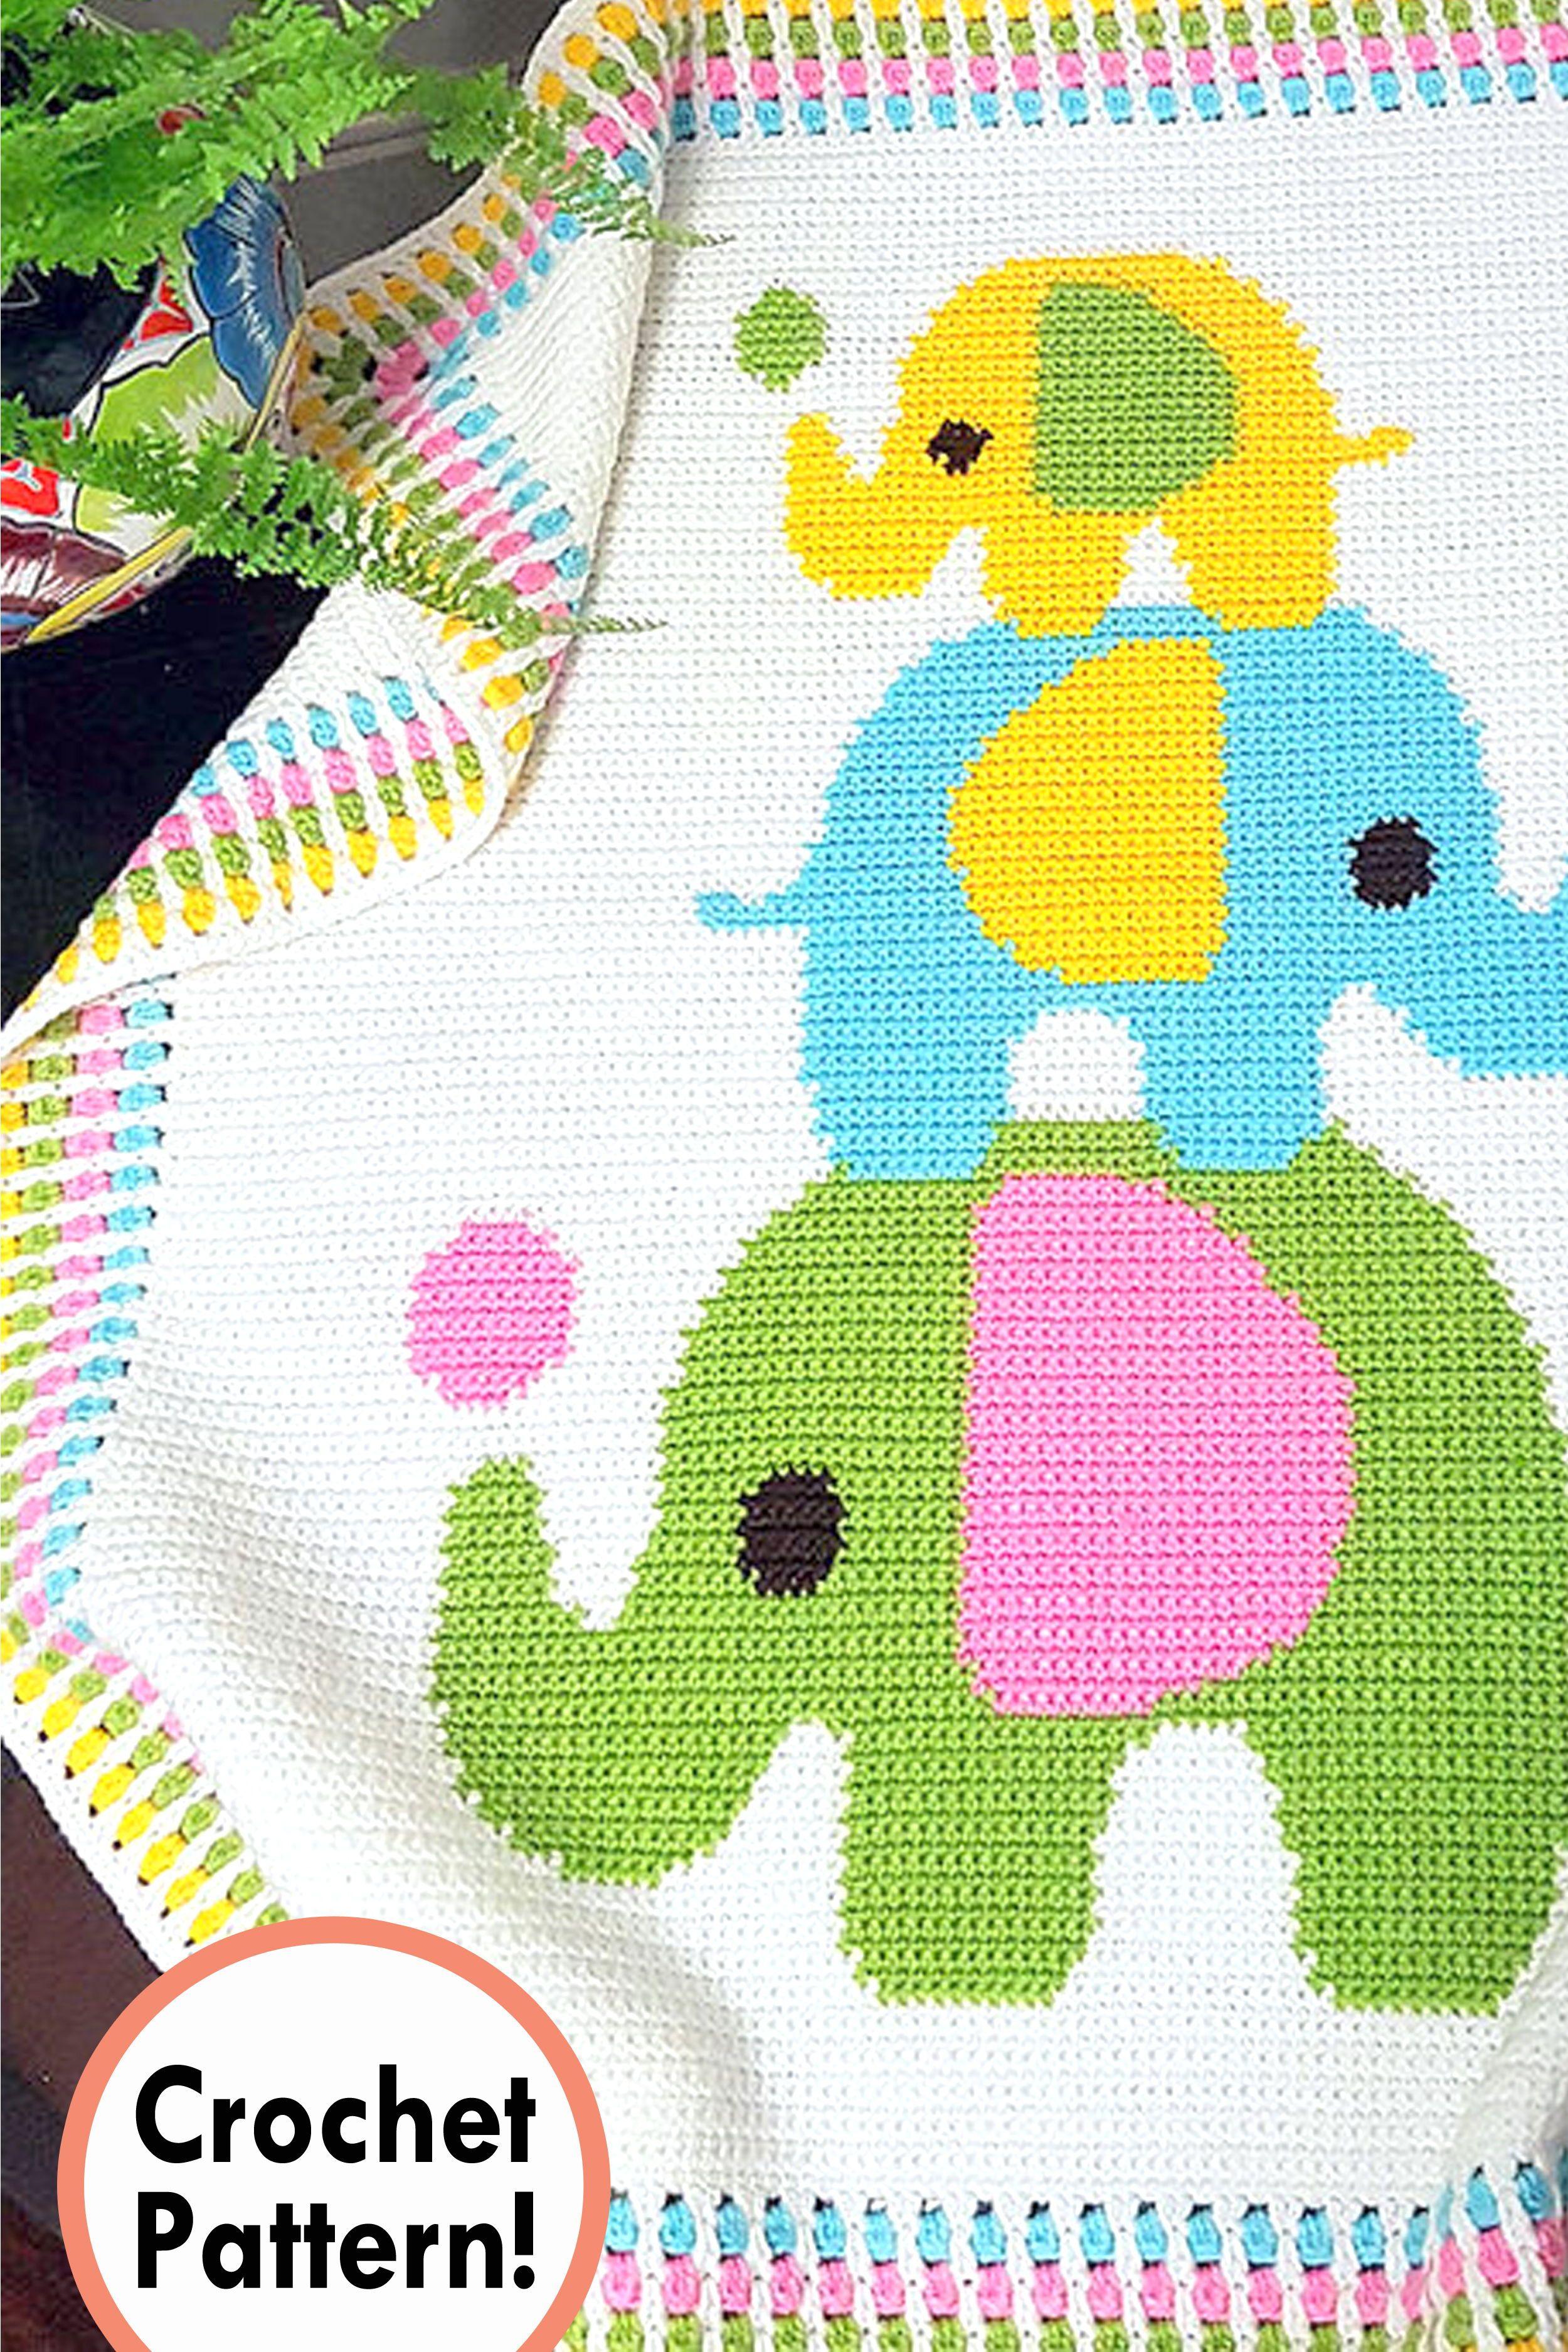 Elephant Baby Blanket Crochet Pattern Crochet Elephant Baby Blanket Crochet Afghan Elepha Baby Blanket Crochet Pattern Elephant Baby Blanket Crochet Elephant